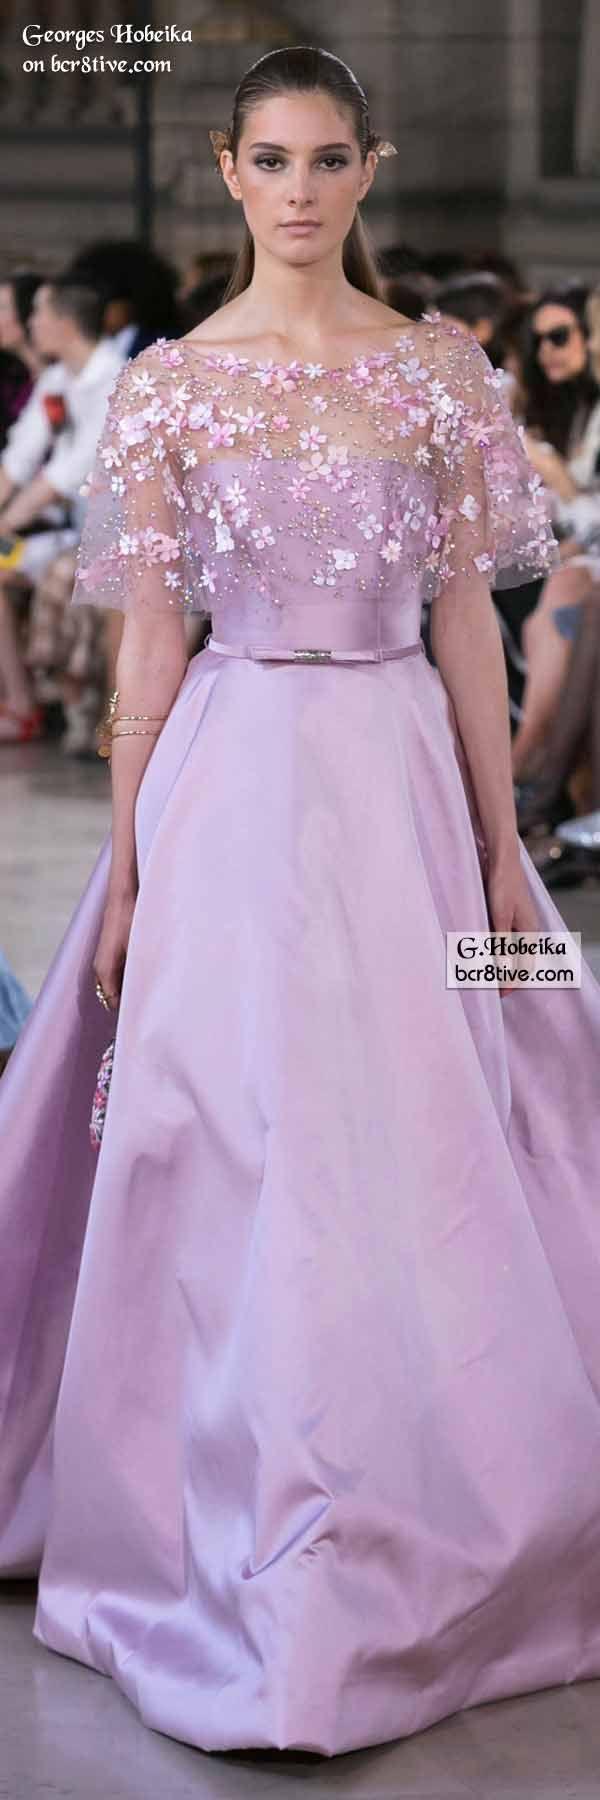 Georges Hobeika Fall 2016 Haute Couture | Vestiditos, Alta costura y ...